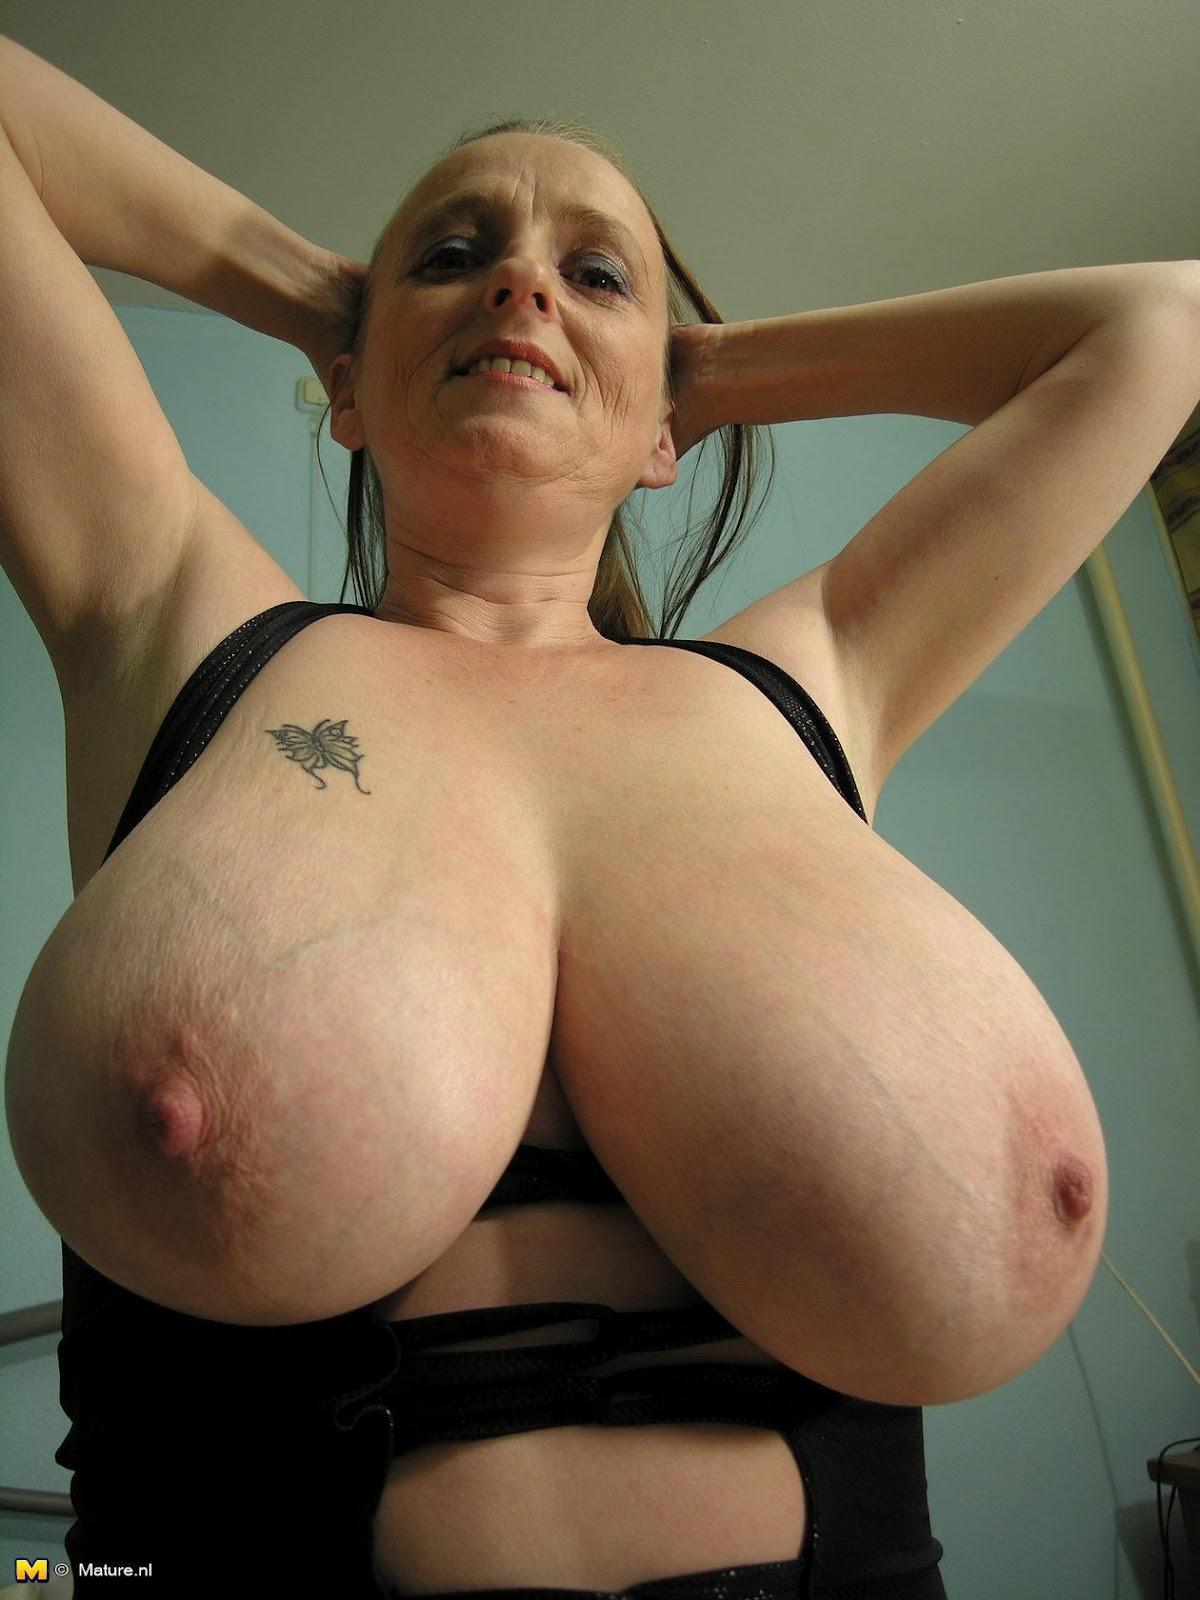 Giant Tits Tube